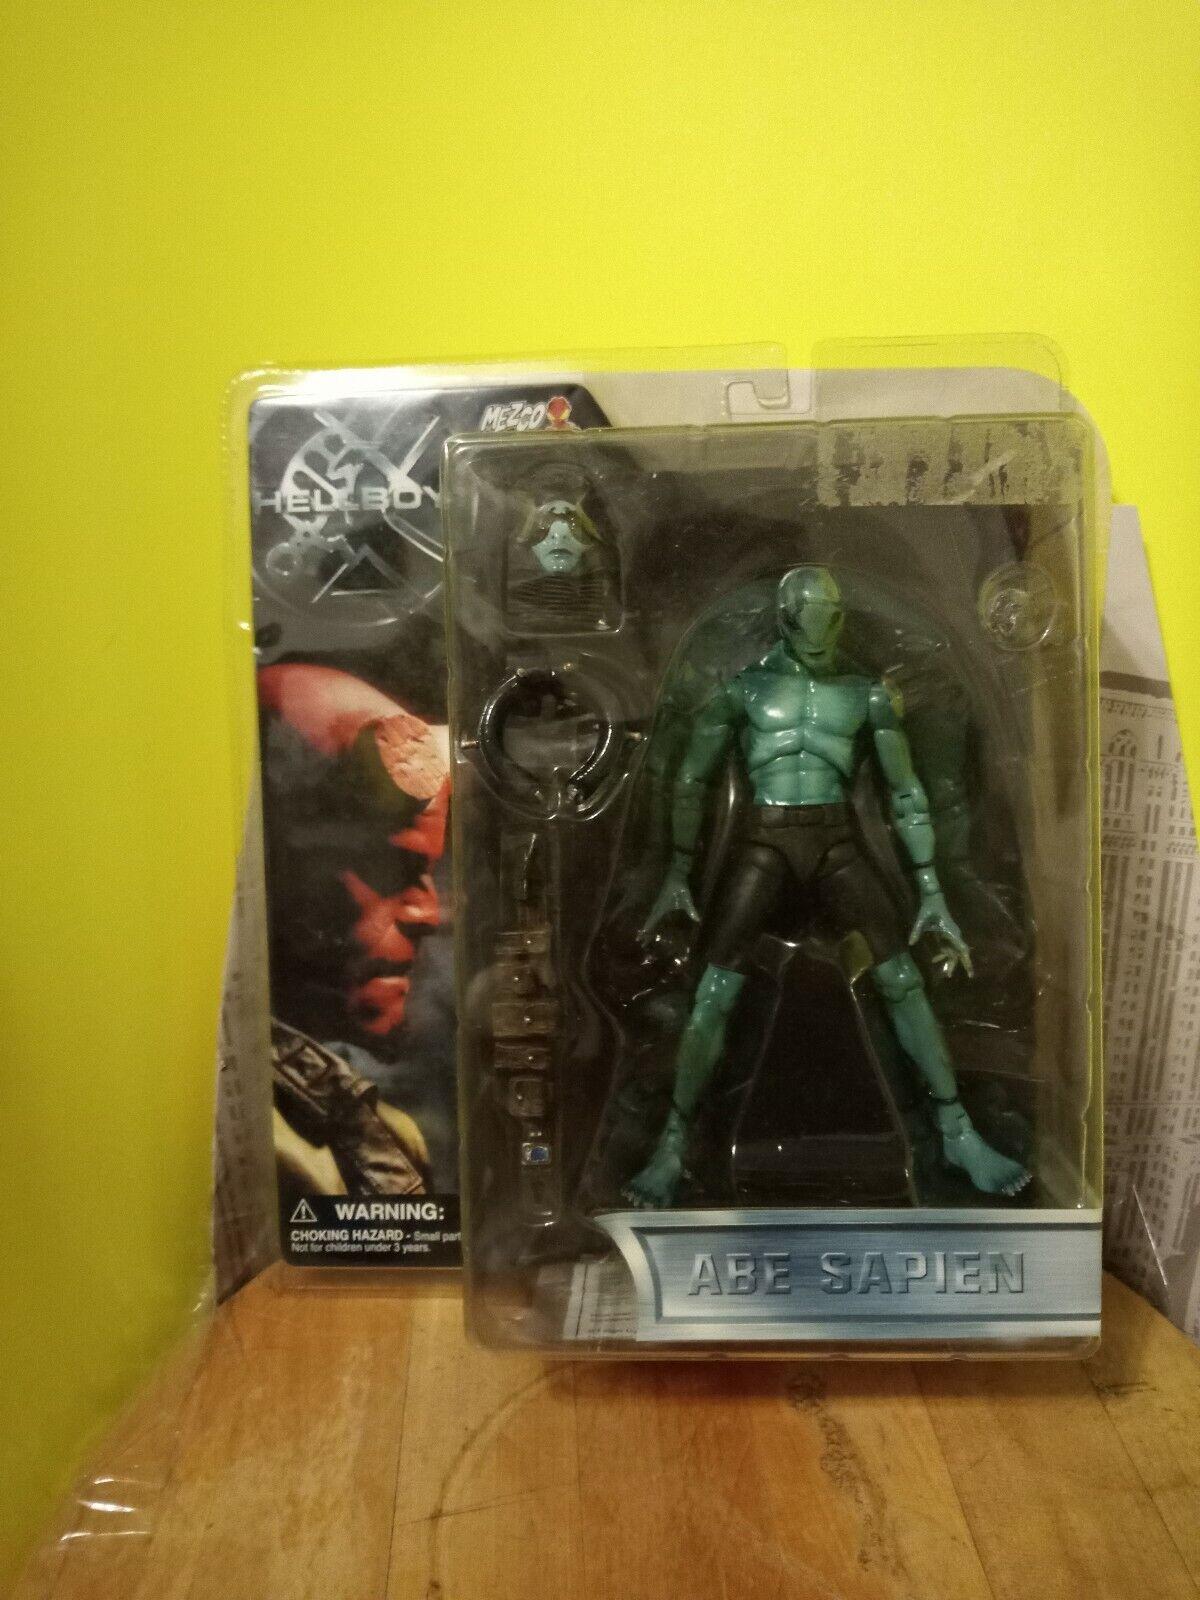 Hellboy Abe Sapien azione cifra [Hellboy] comic libros heroes collectible